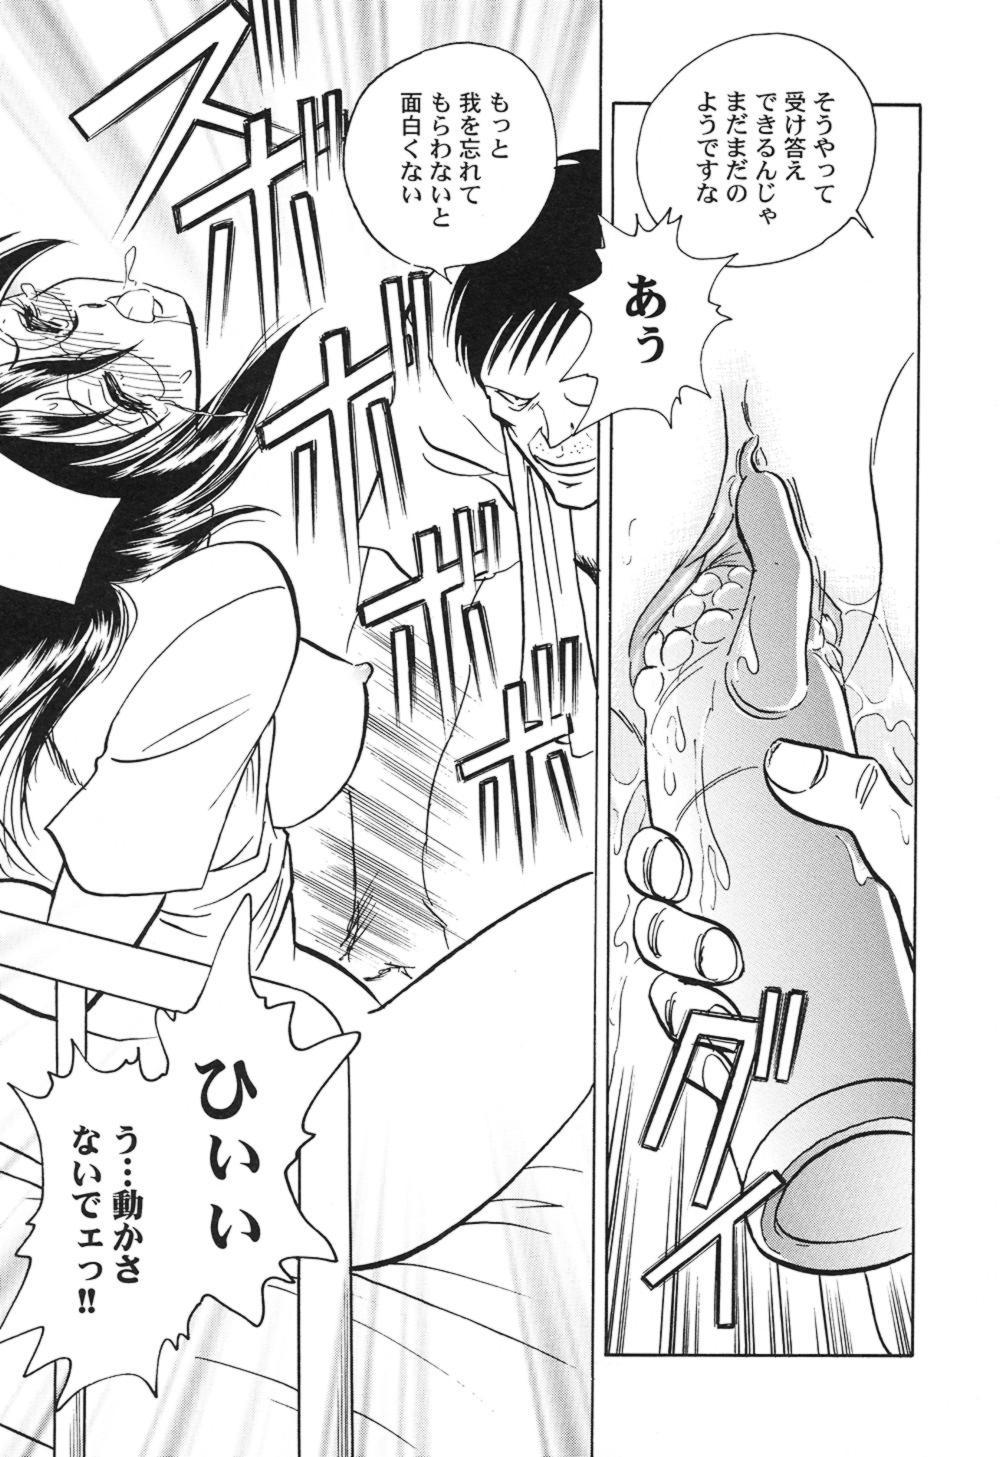 Hageshii Kagai Jugyou 85